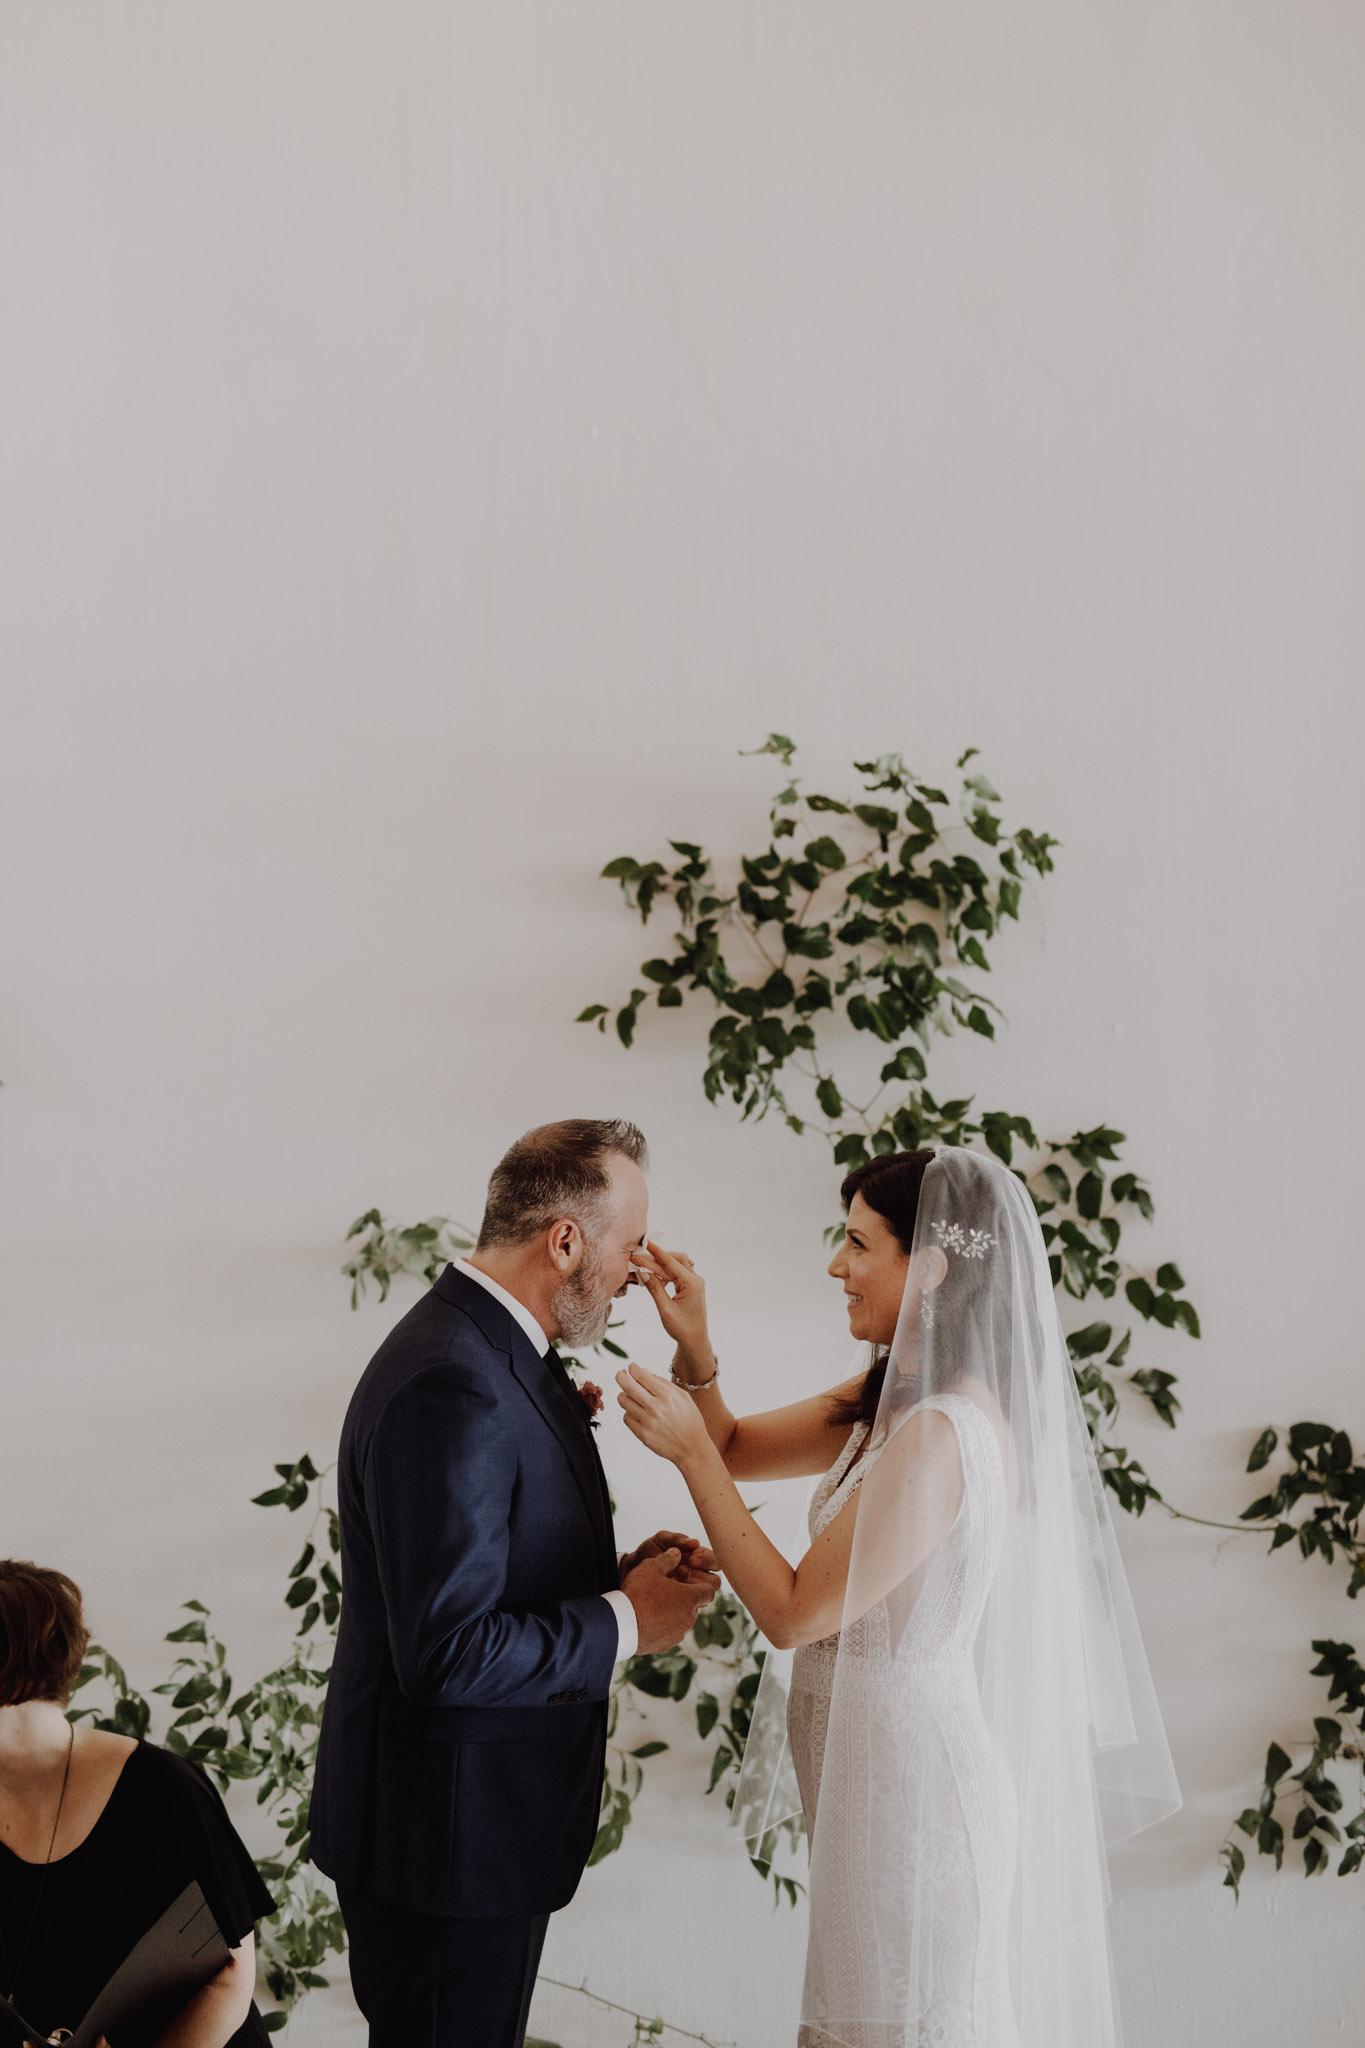 District 28 Wedding Toronto - Bride & groom wipe tears